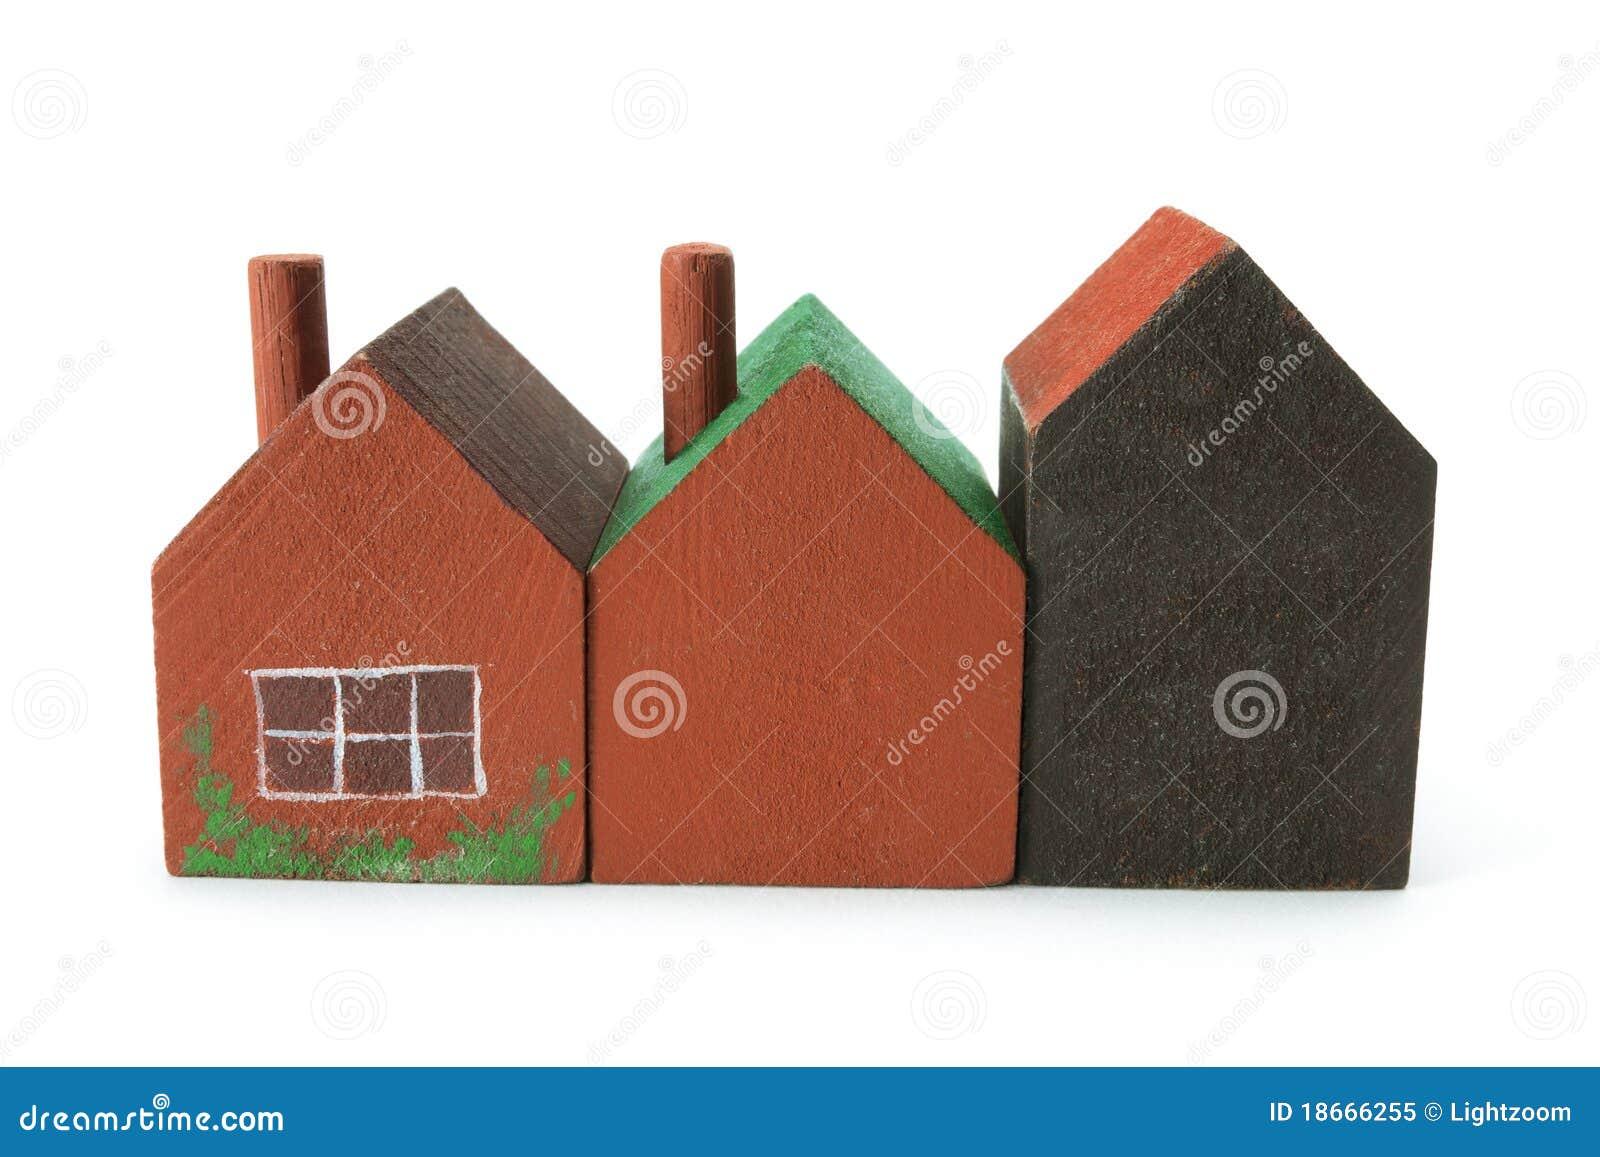 Casas miniatura de madera foto de archivo libre de regal as imagen 18666255 - Casas en miniatura de madera ...